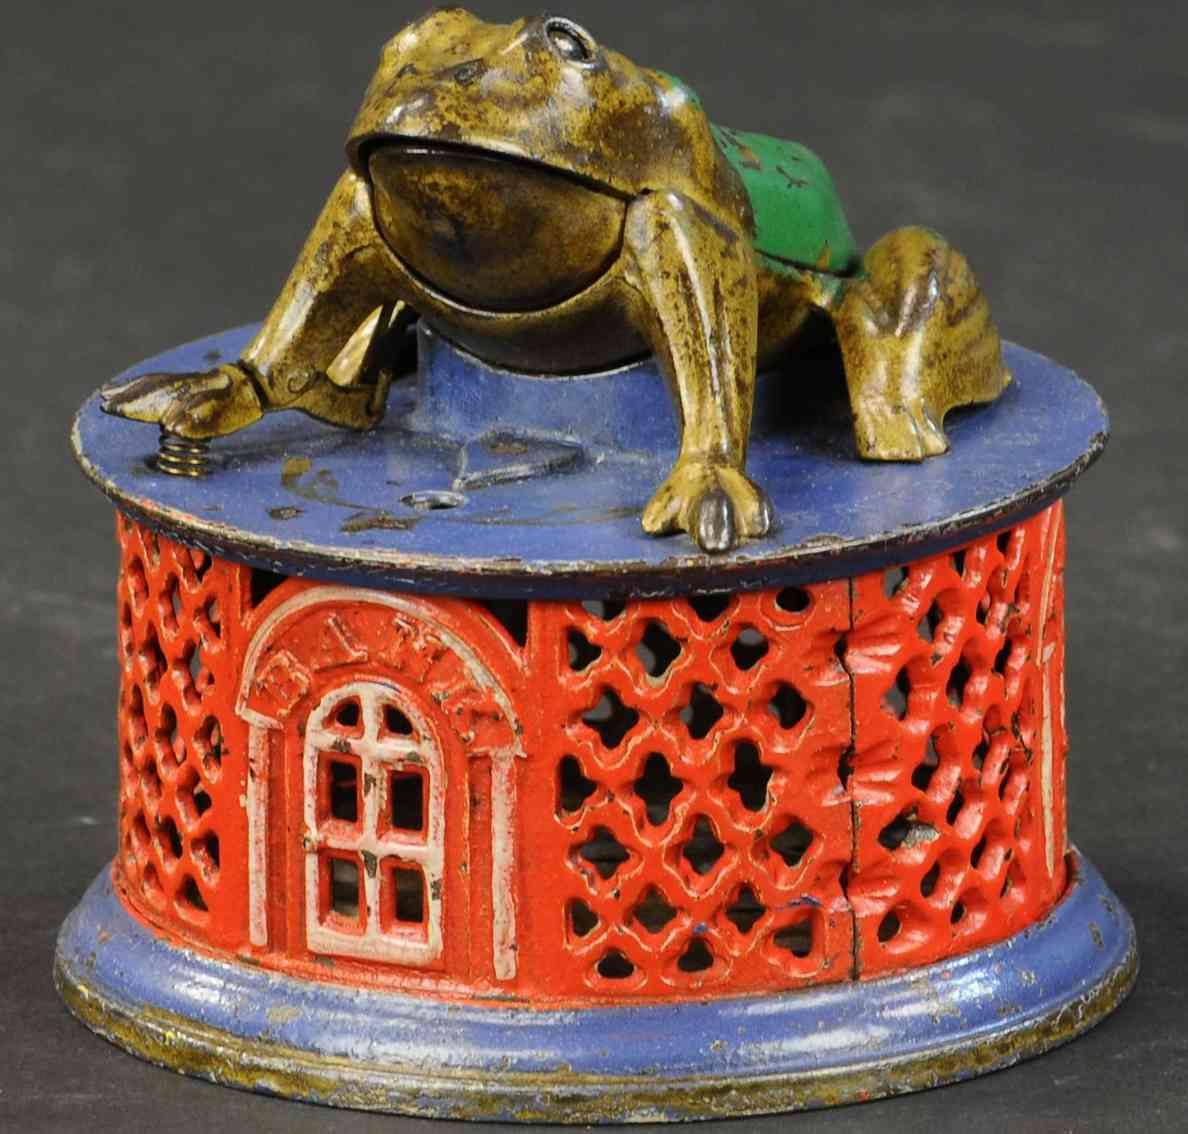 stevens co j & e 110 cast iron toy frog on lattice mechanical bank red blue gold